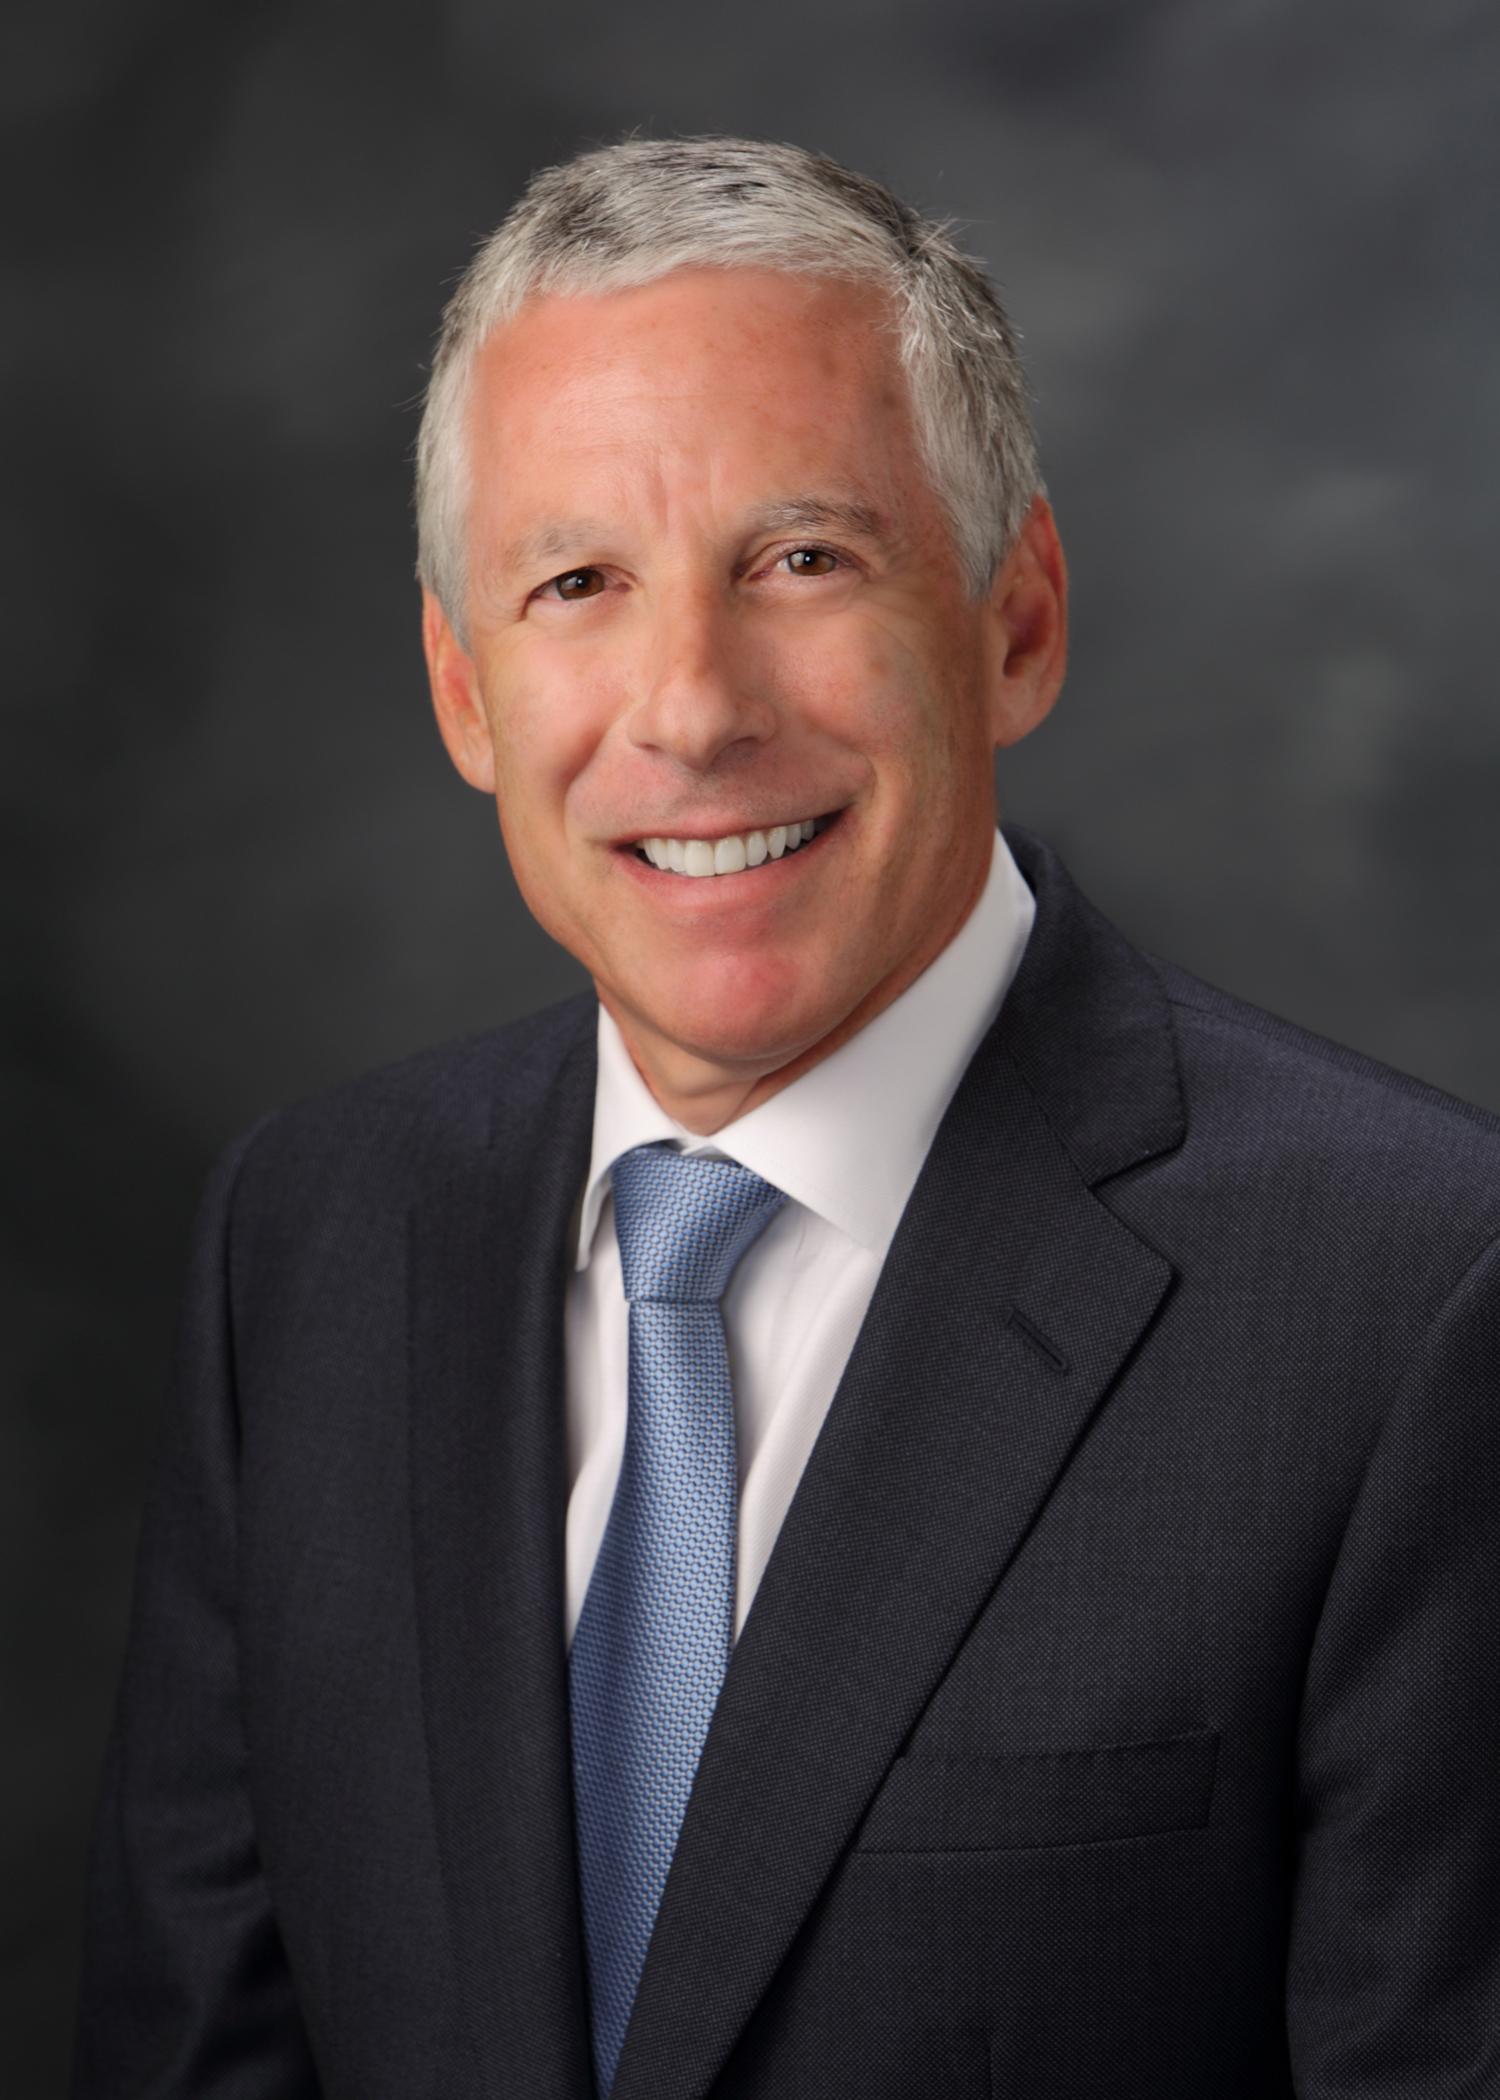 Bennett Pozil - Bennett Pozil 银行家,现以执行副总裁身份就职于East West 银行。Pozil负责监管美国和中国娱乐贷款行业的业务。最近由East West 银行提供贷款的电影项目包括John Woo的The Crossing和Chen Kaige的The Monk。在加入East West银行之前,Pozil曾担任Natixis洛杉矶办事处的常务董事长达11年。在Natixis,Pozil完成了包括卧虎藏龙在内的一百多部电影的融资。